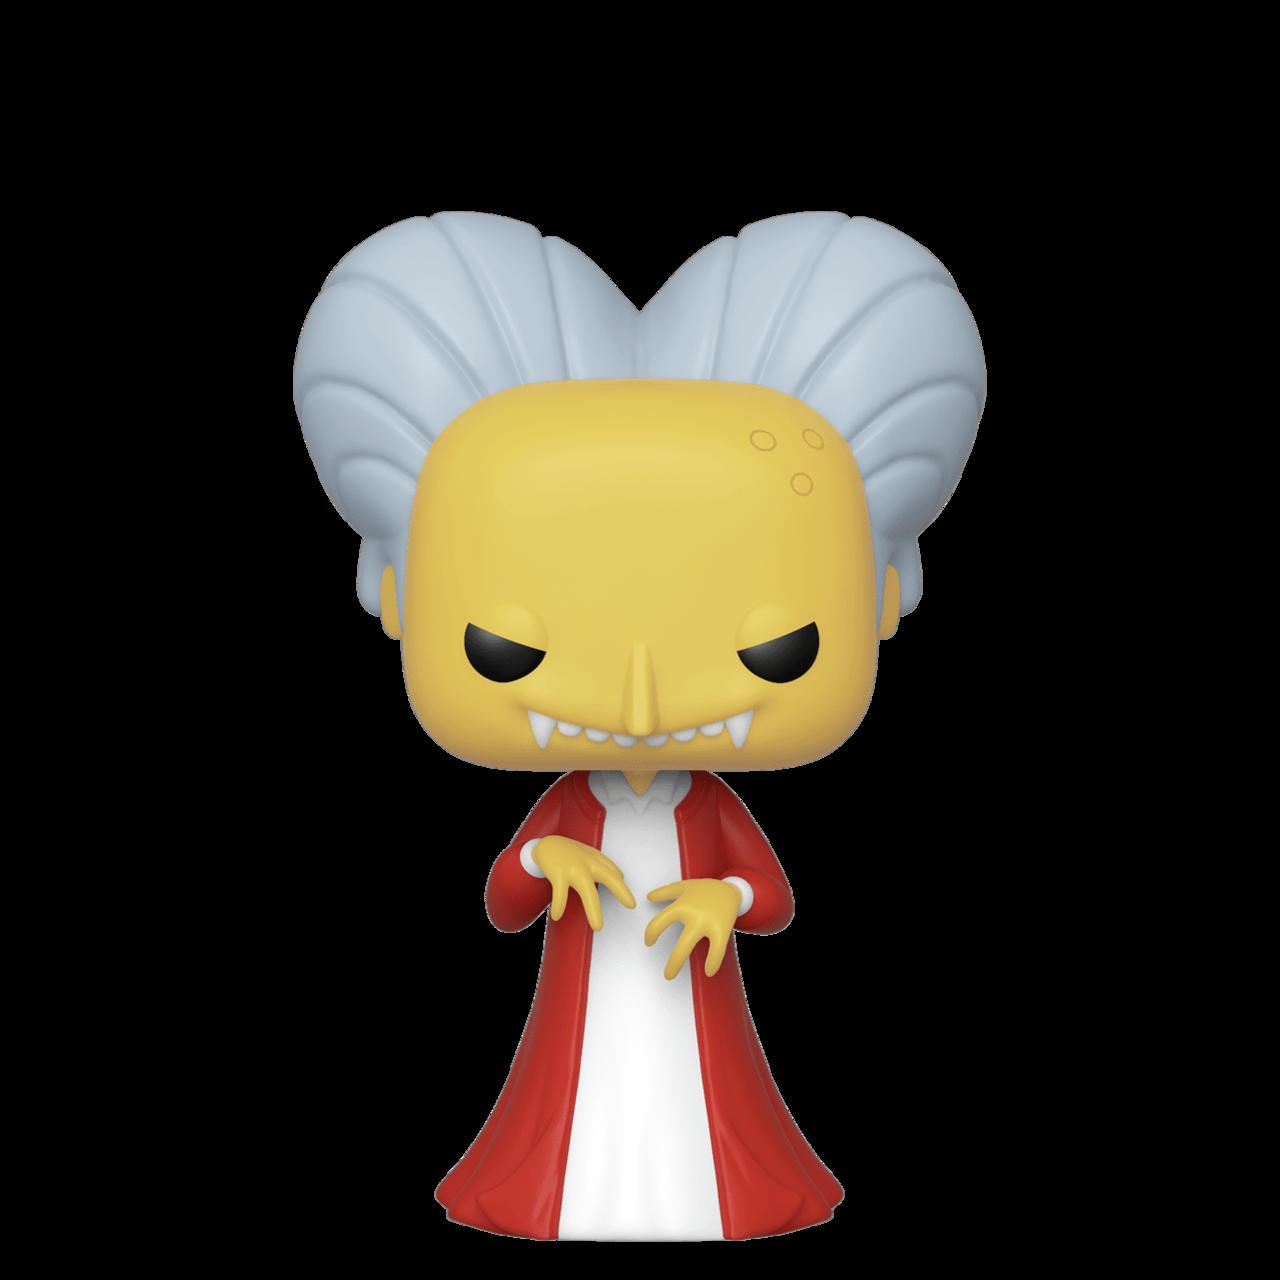 Vampire Mr. Burns